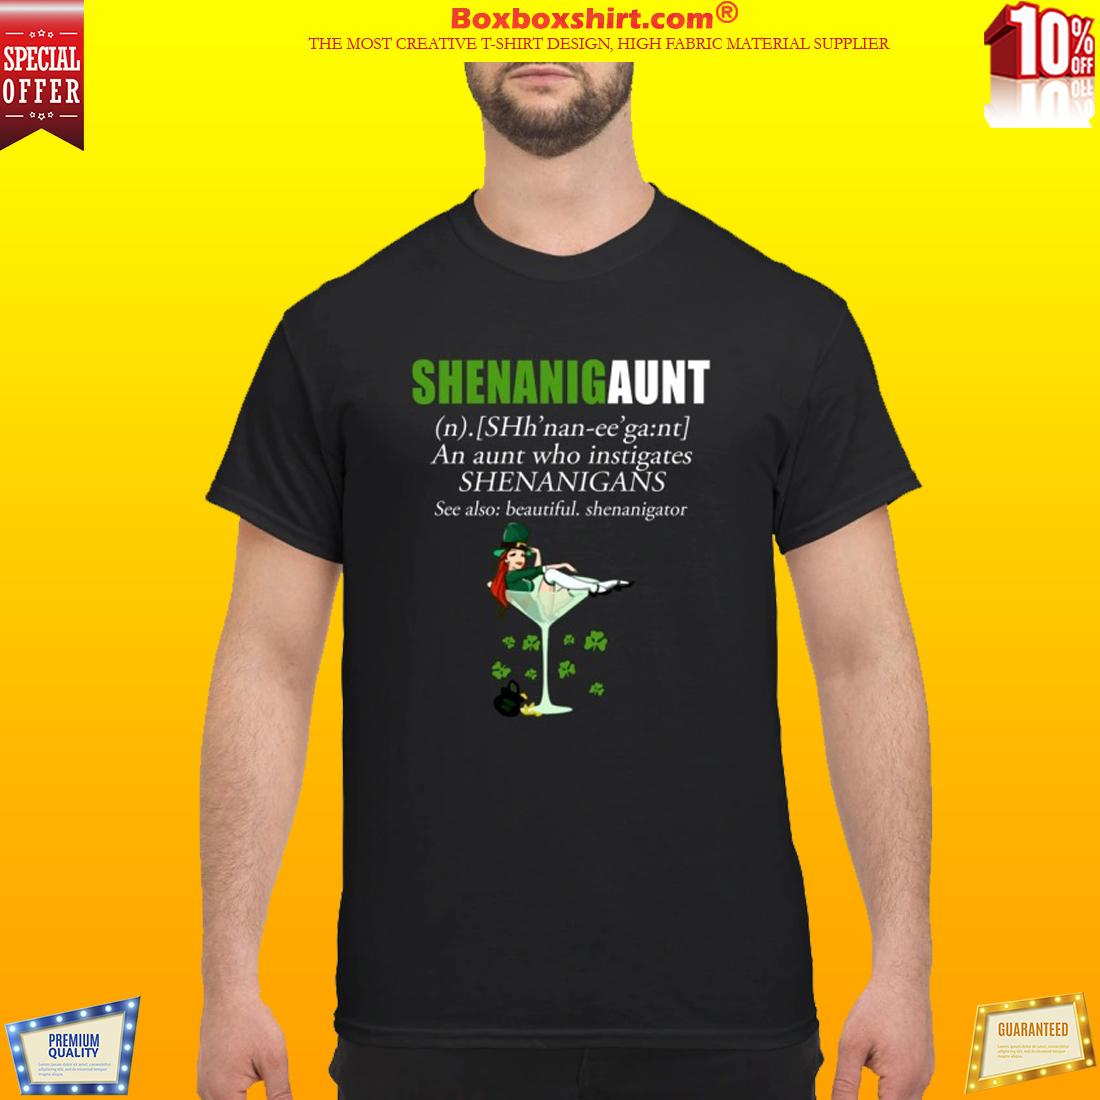 Shenanigaunt an aunt who instigates Shenanigans classic shirt